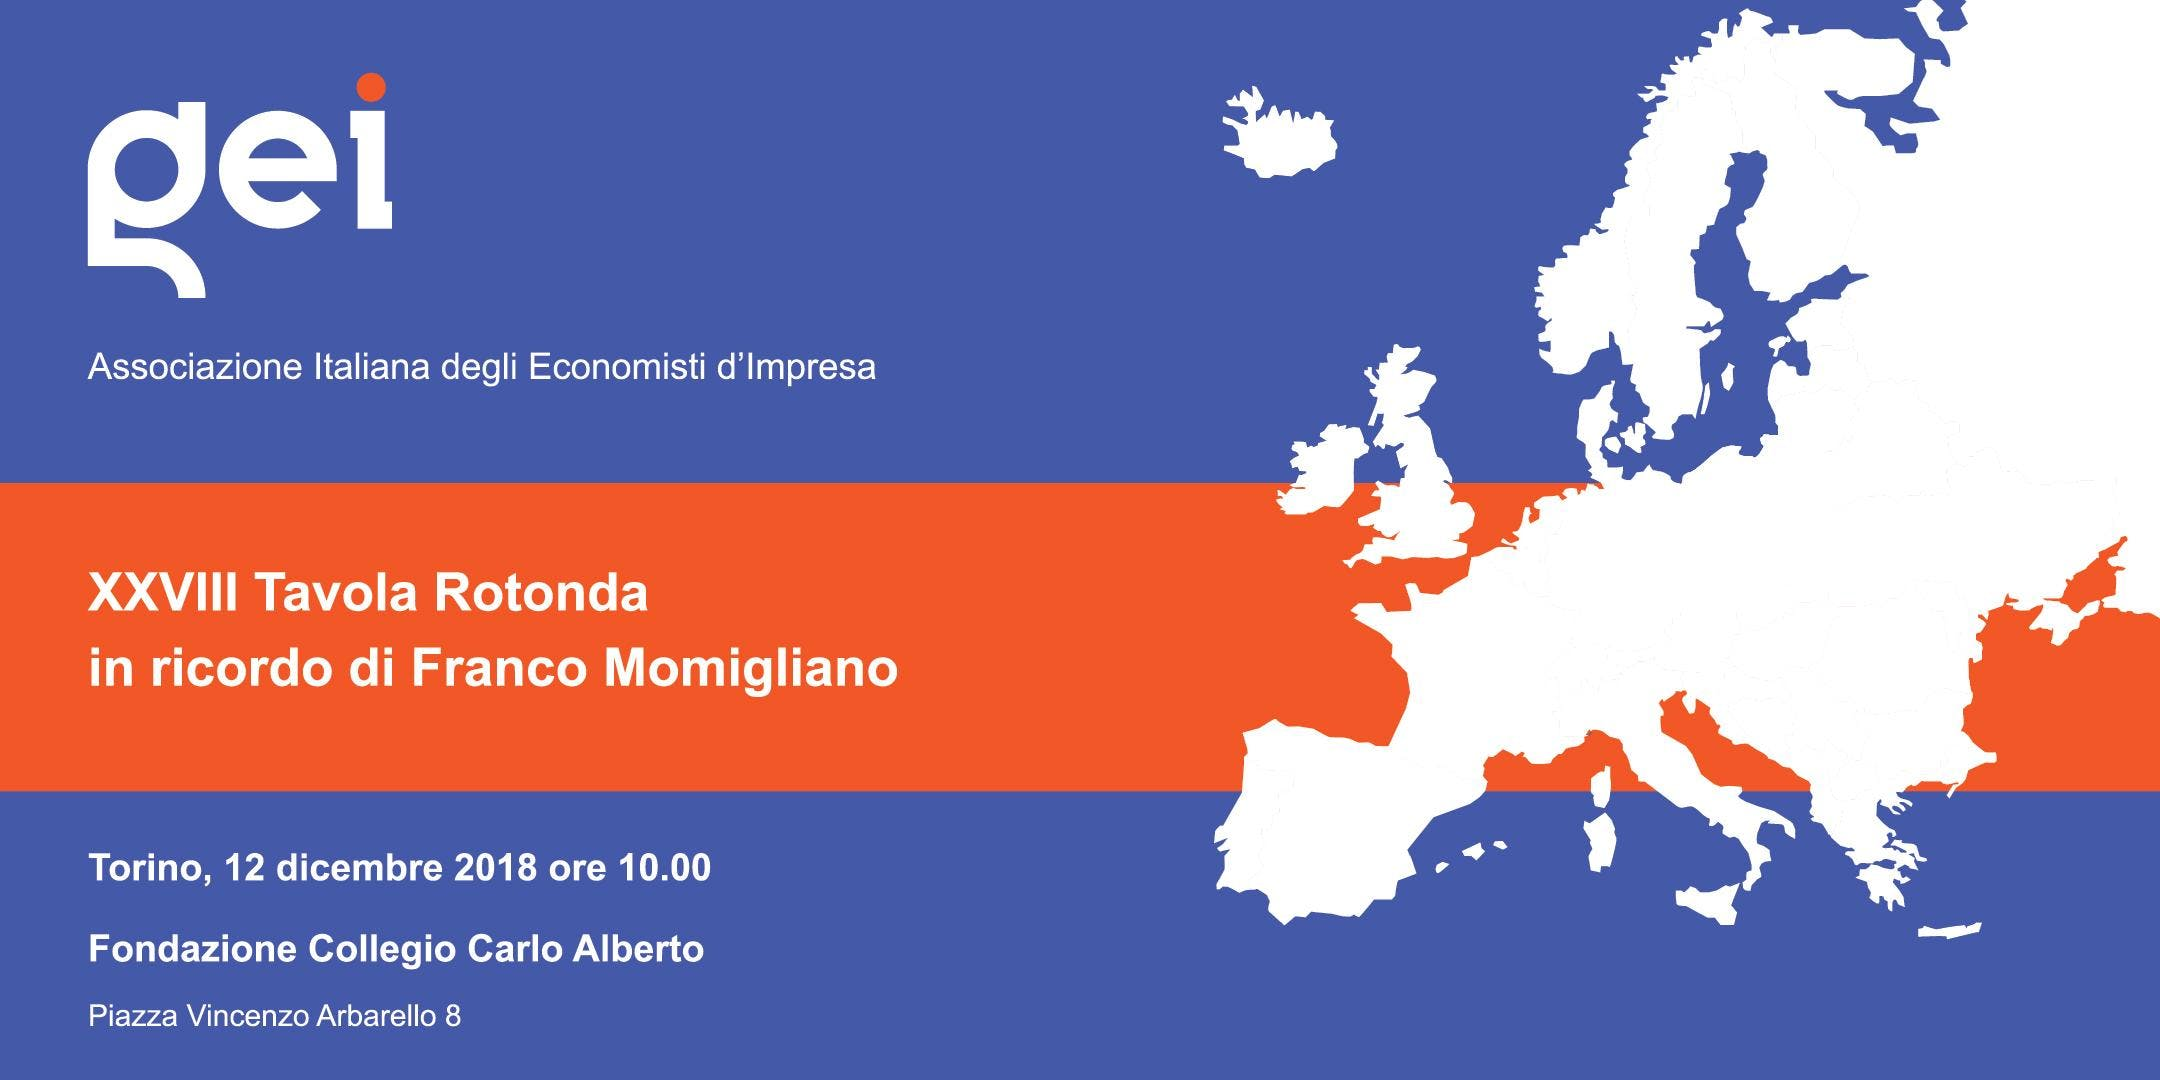 XXVIII Tavola Rotonda Franco Momigliano sulla